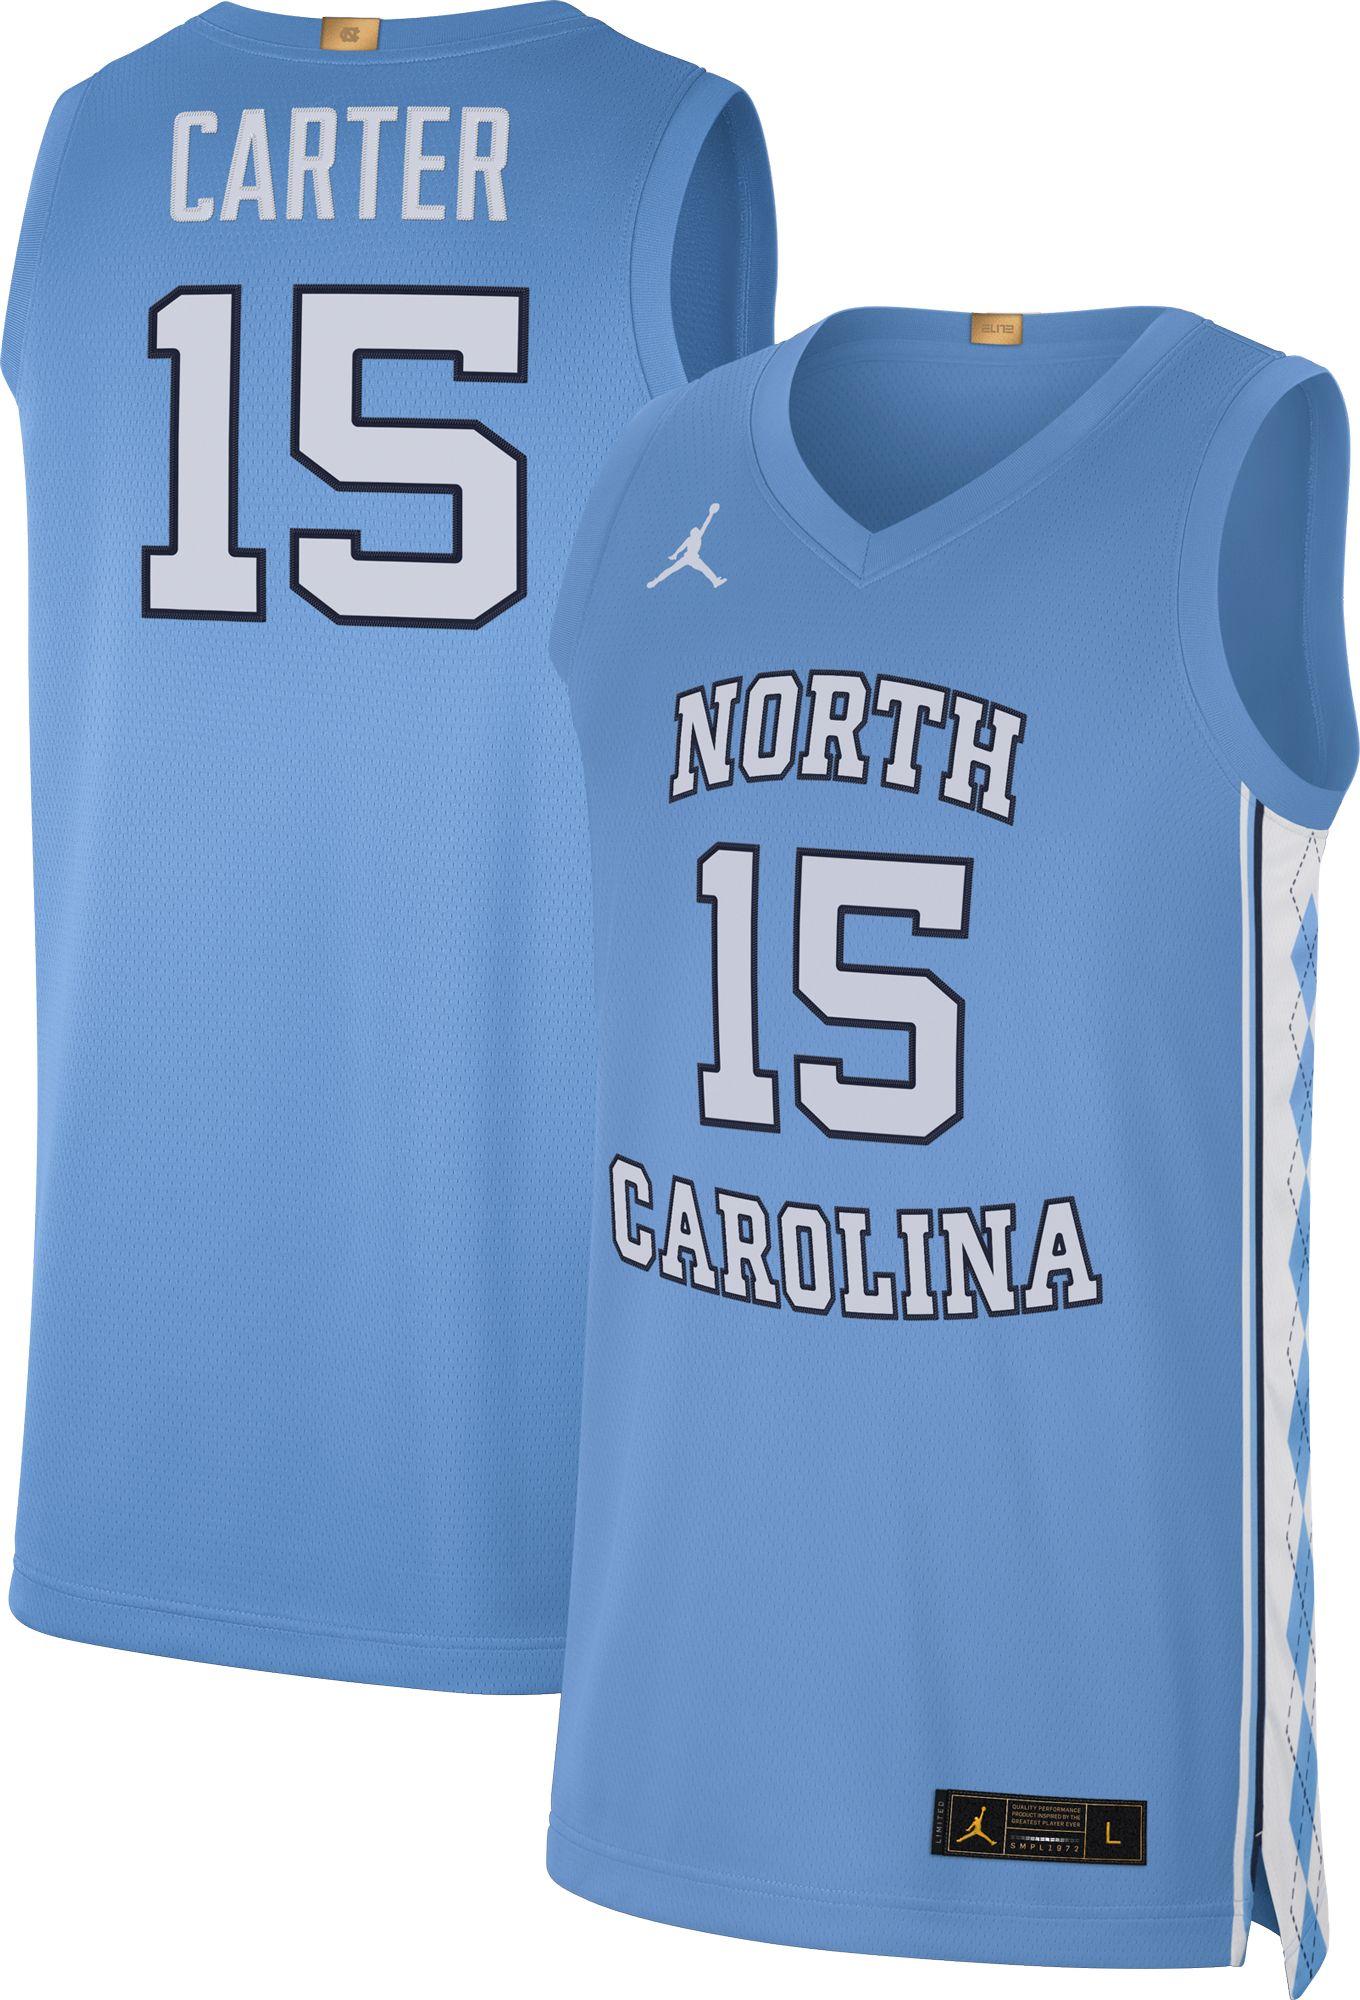 north carolina jersey